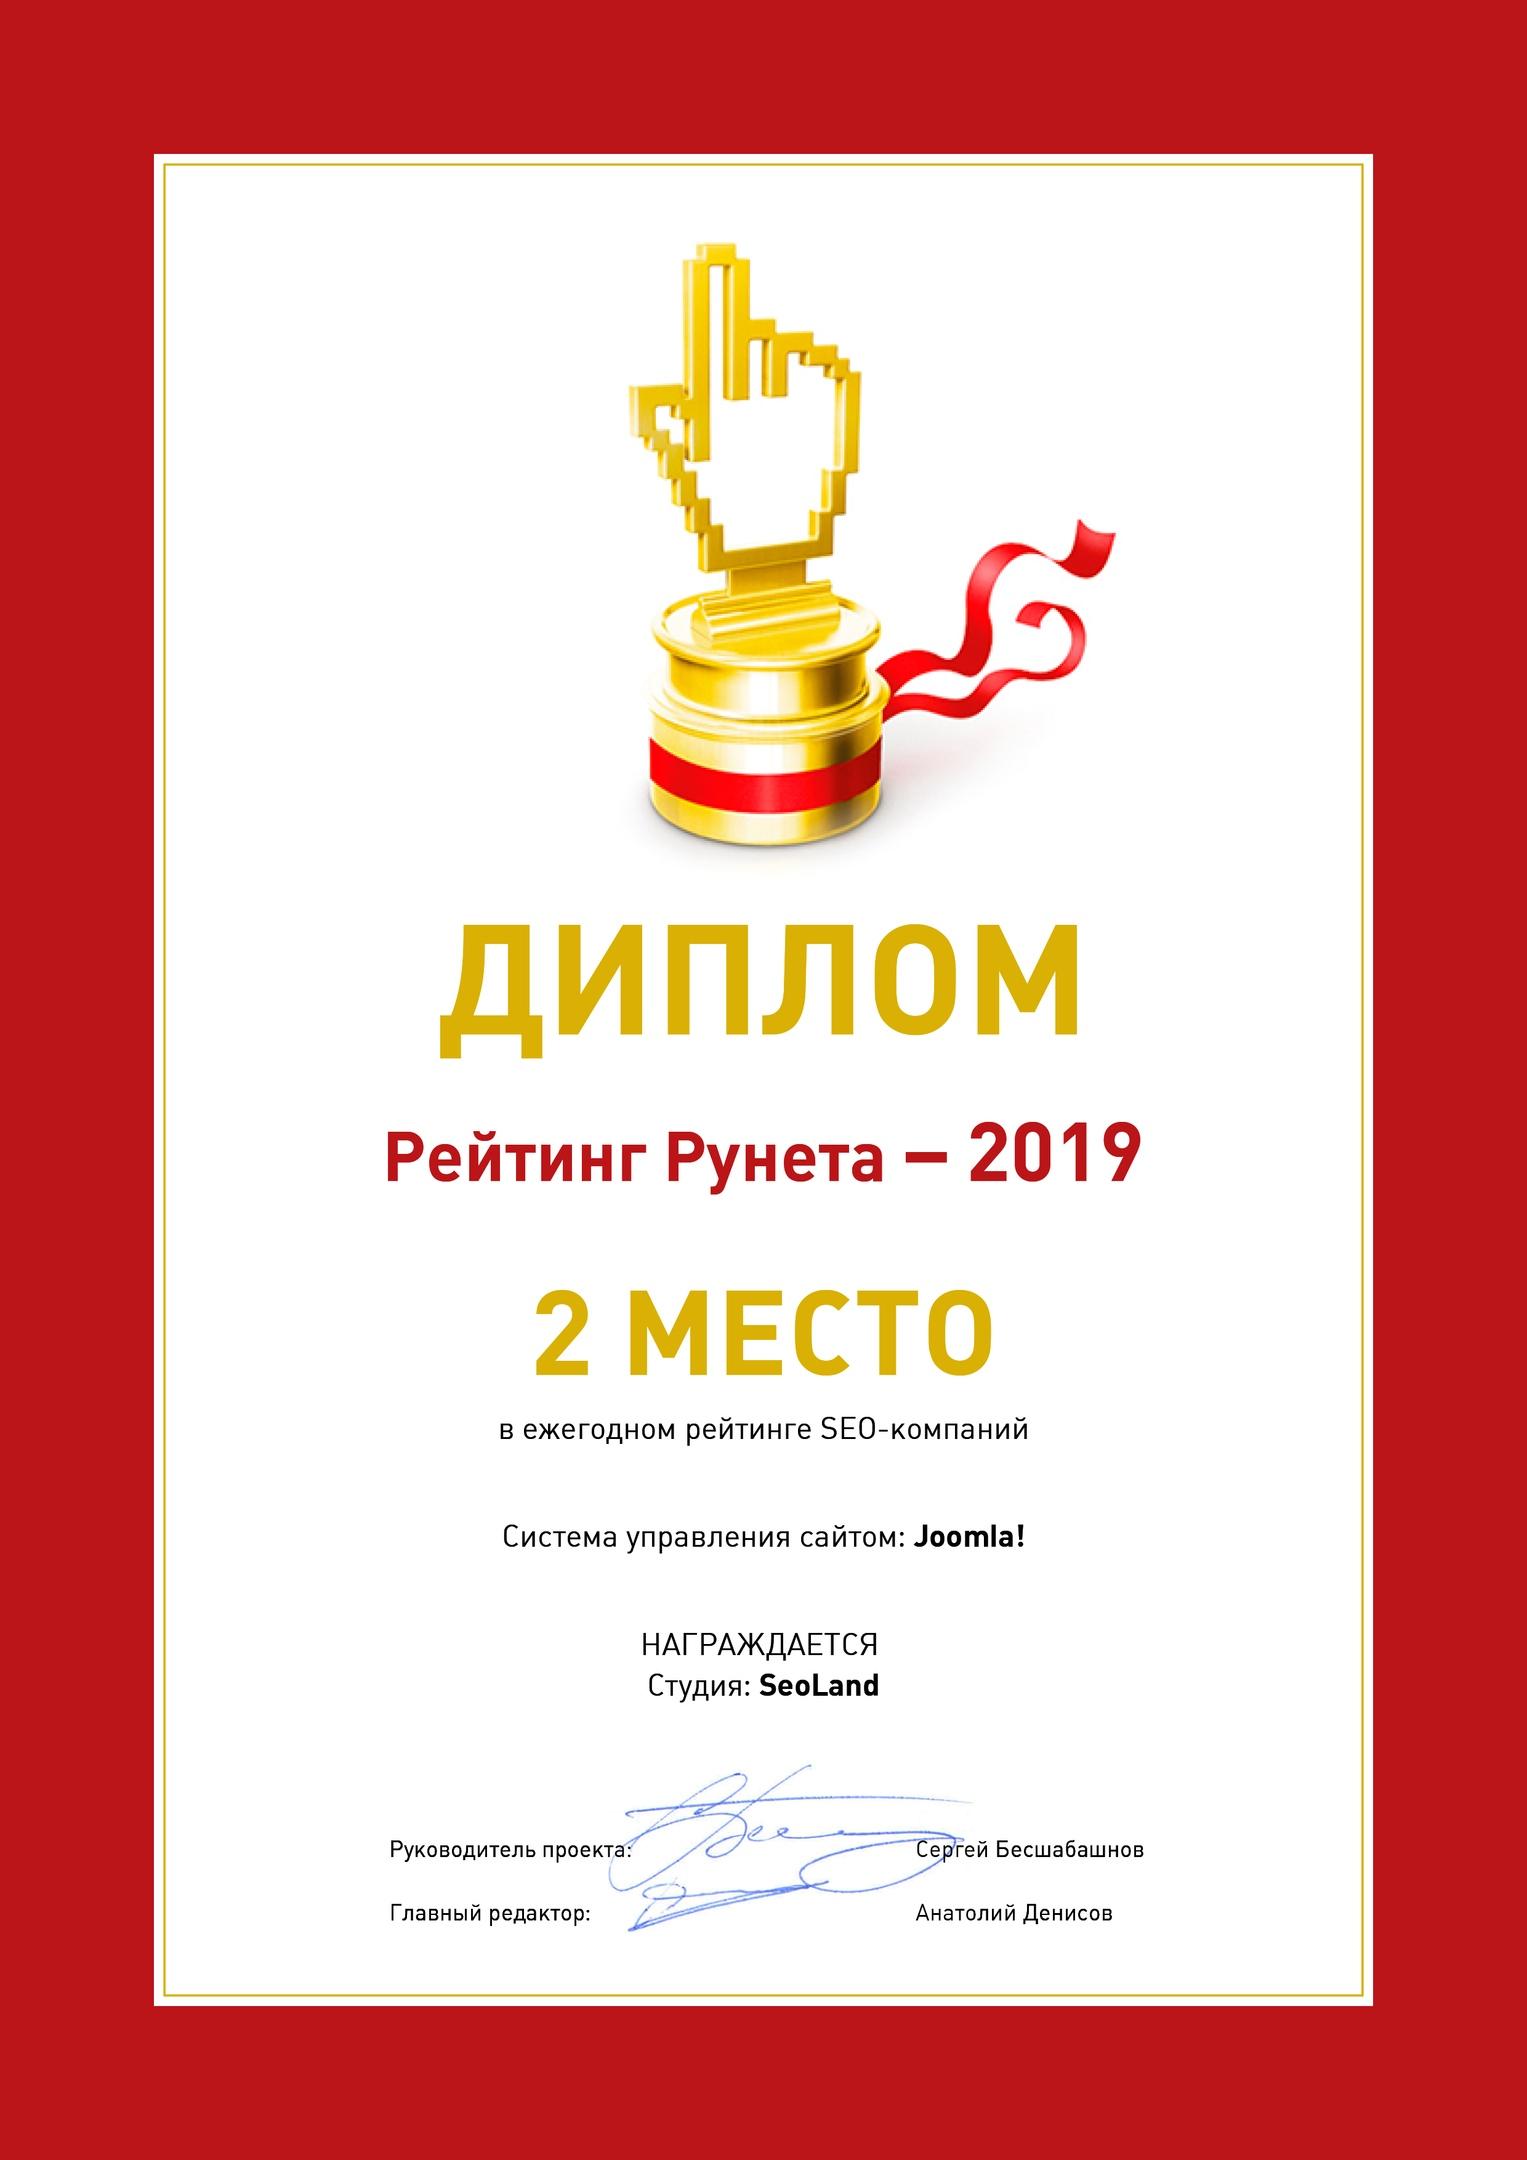 Компания SeoLand заняла 2 место в России среди СЕО компаний.